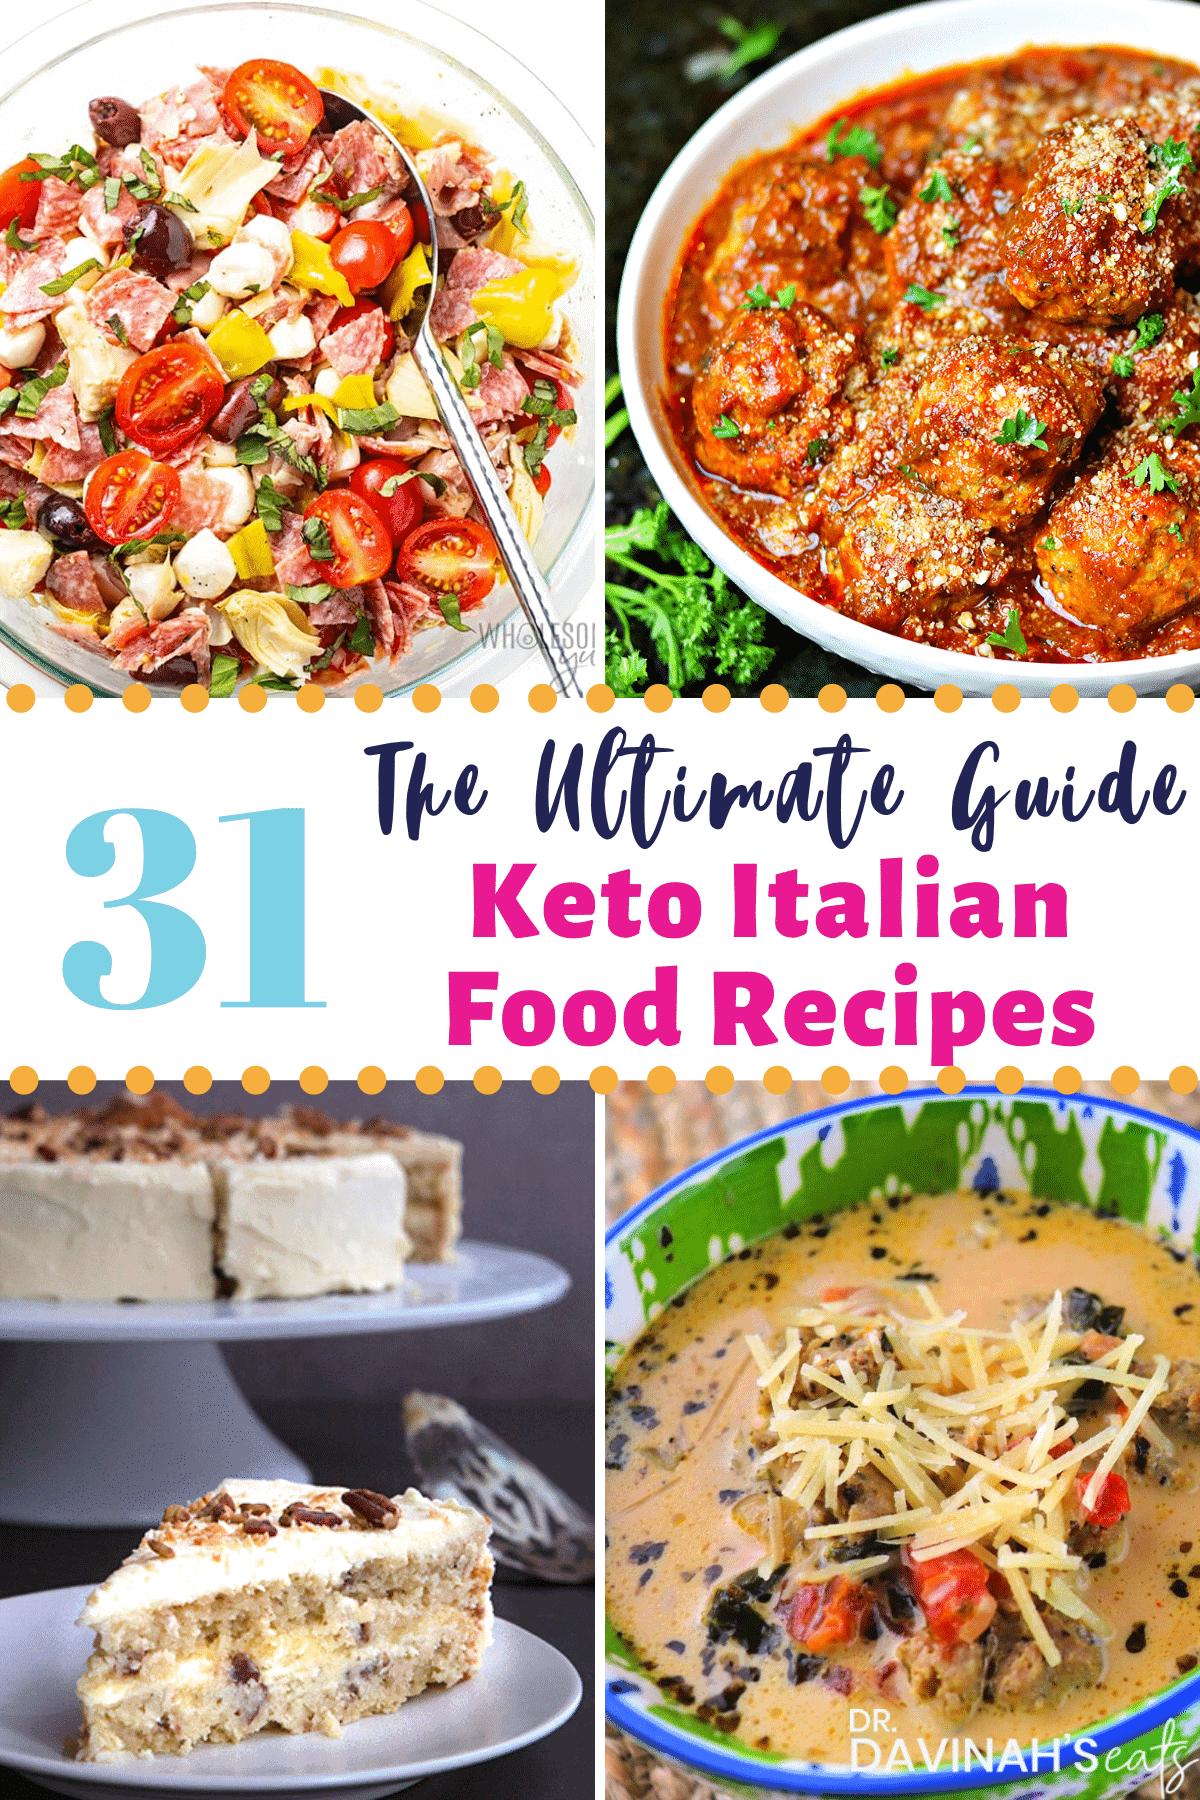 Keto Italian Food Recipes Pinterest image